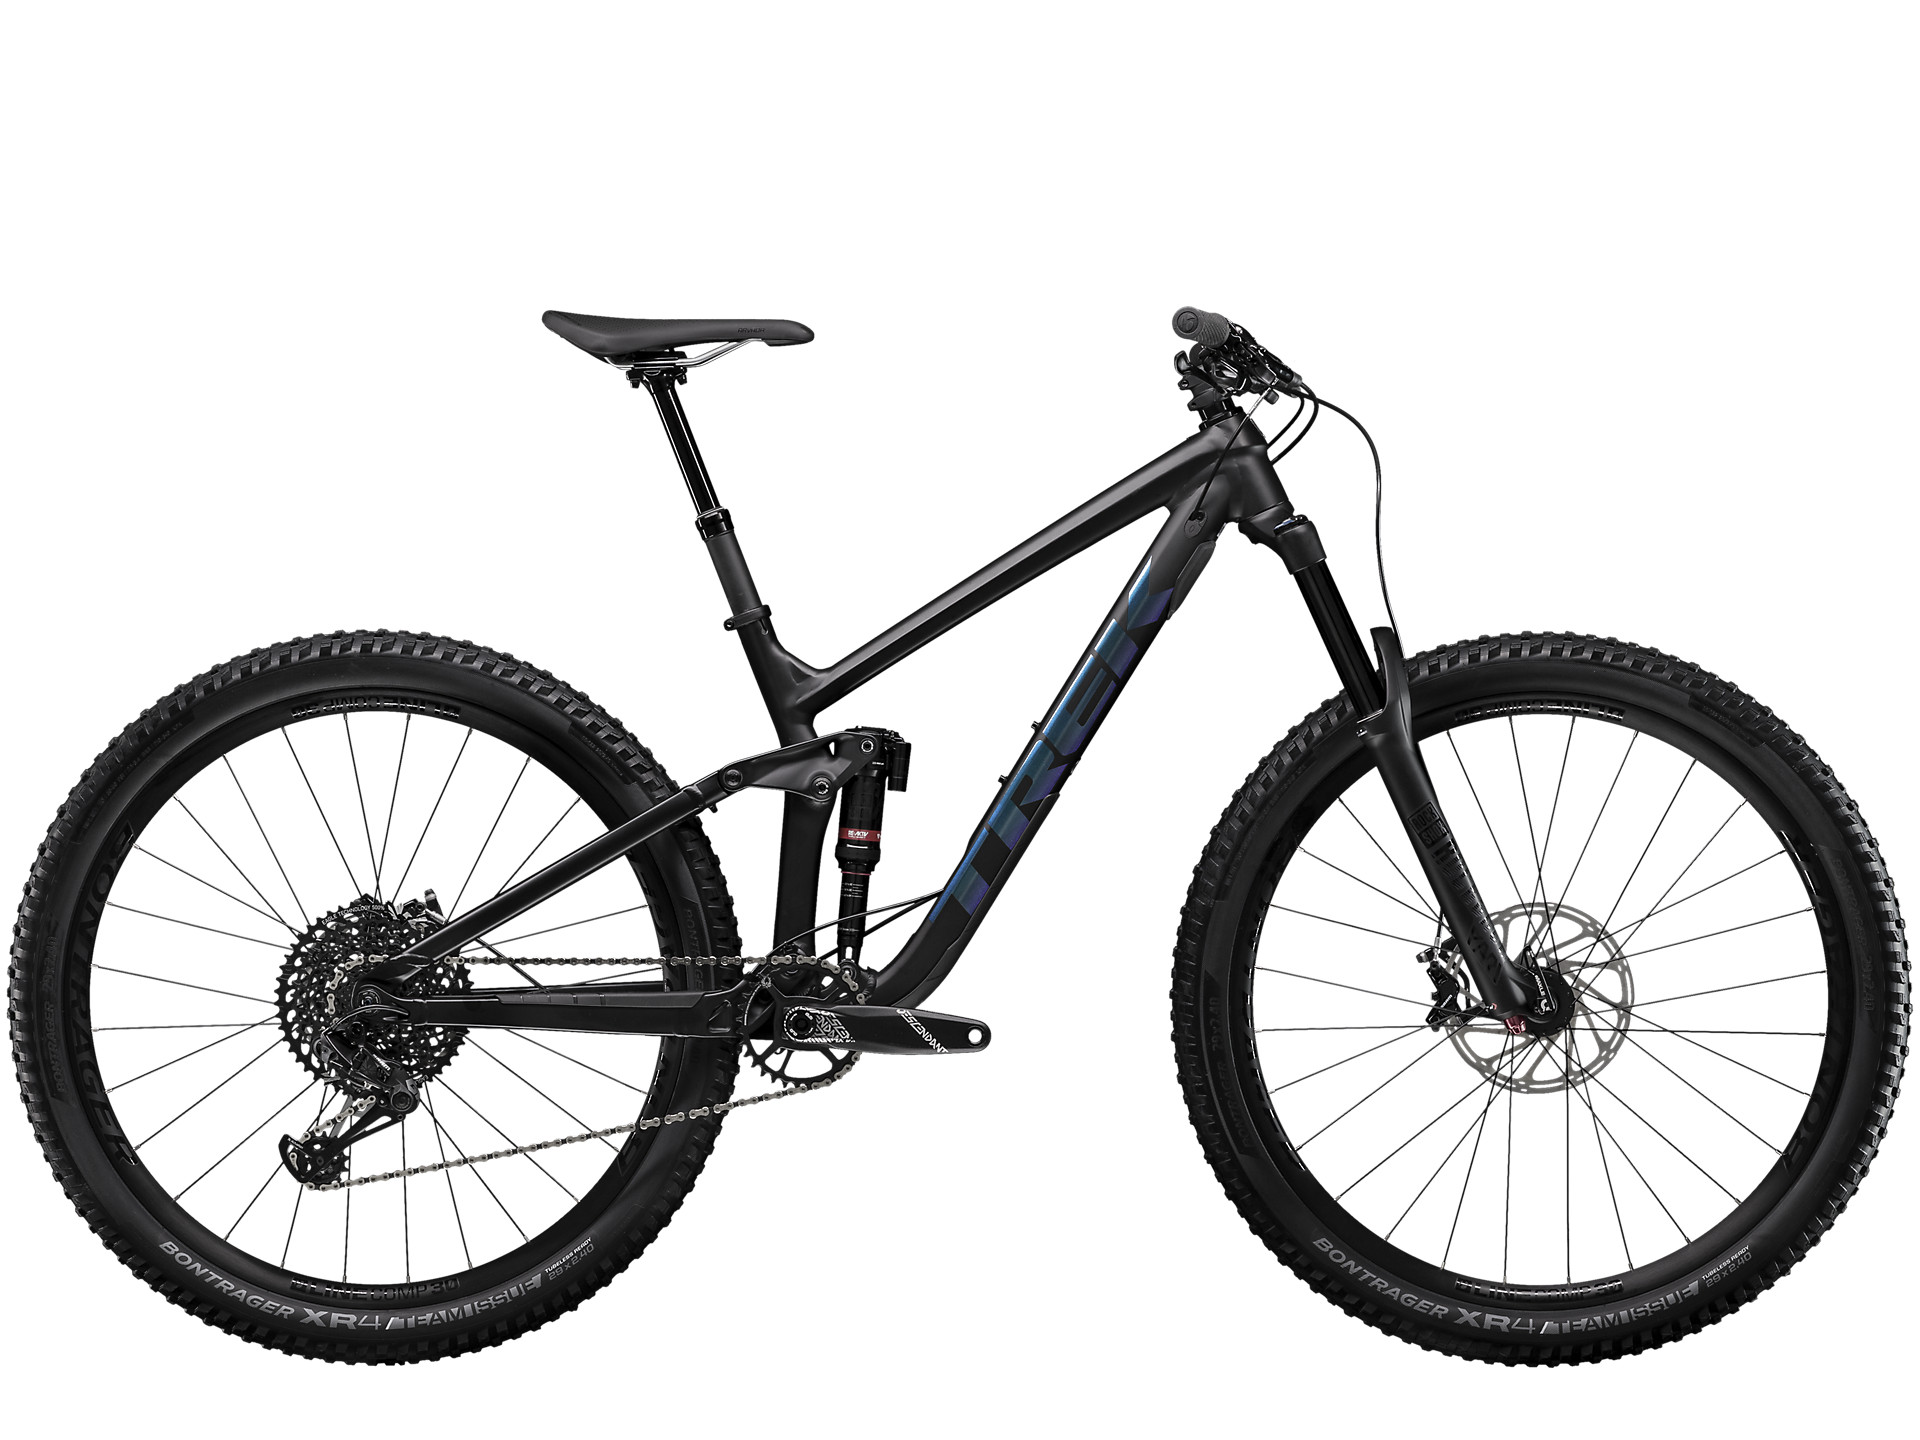 Bicicletta Montana 275